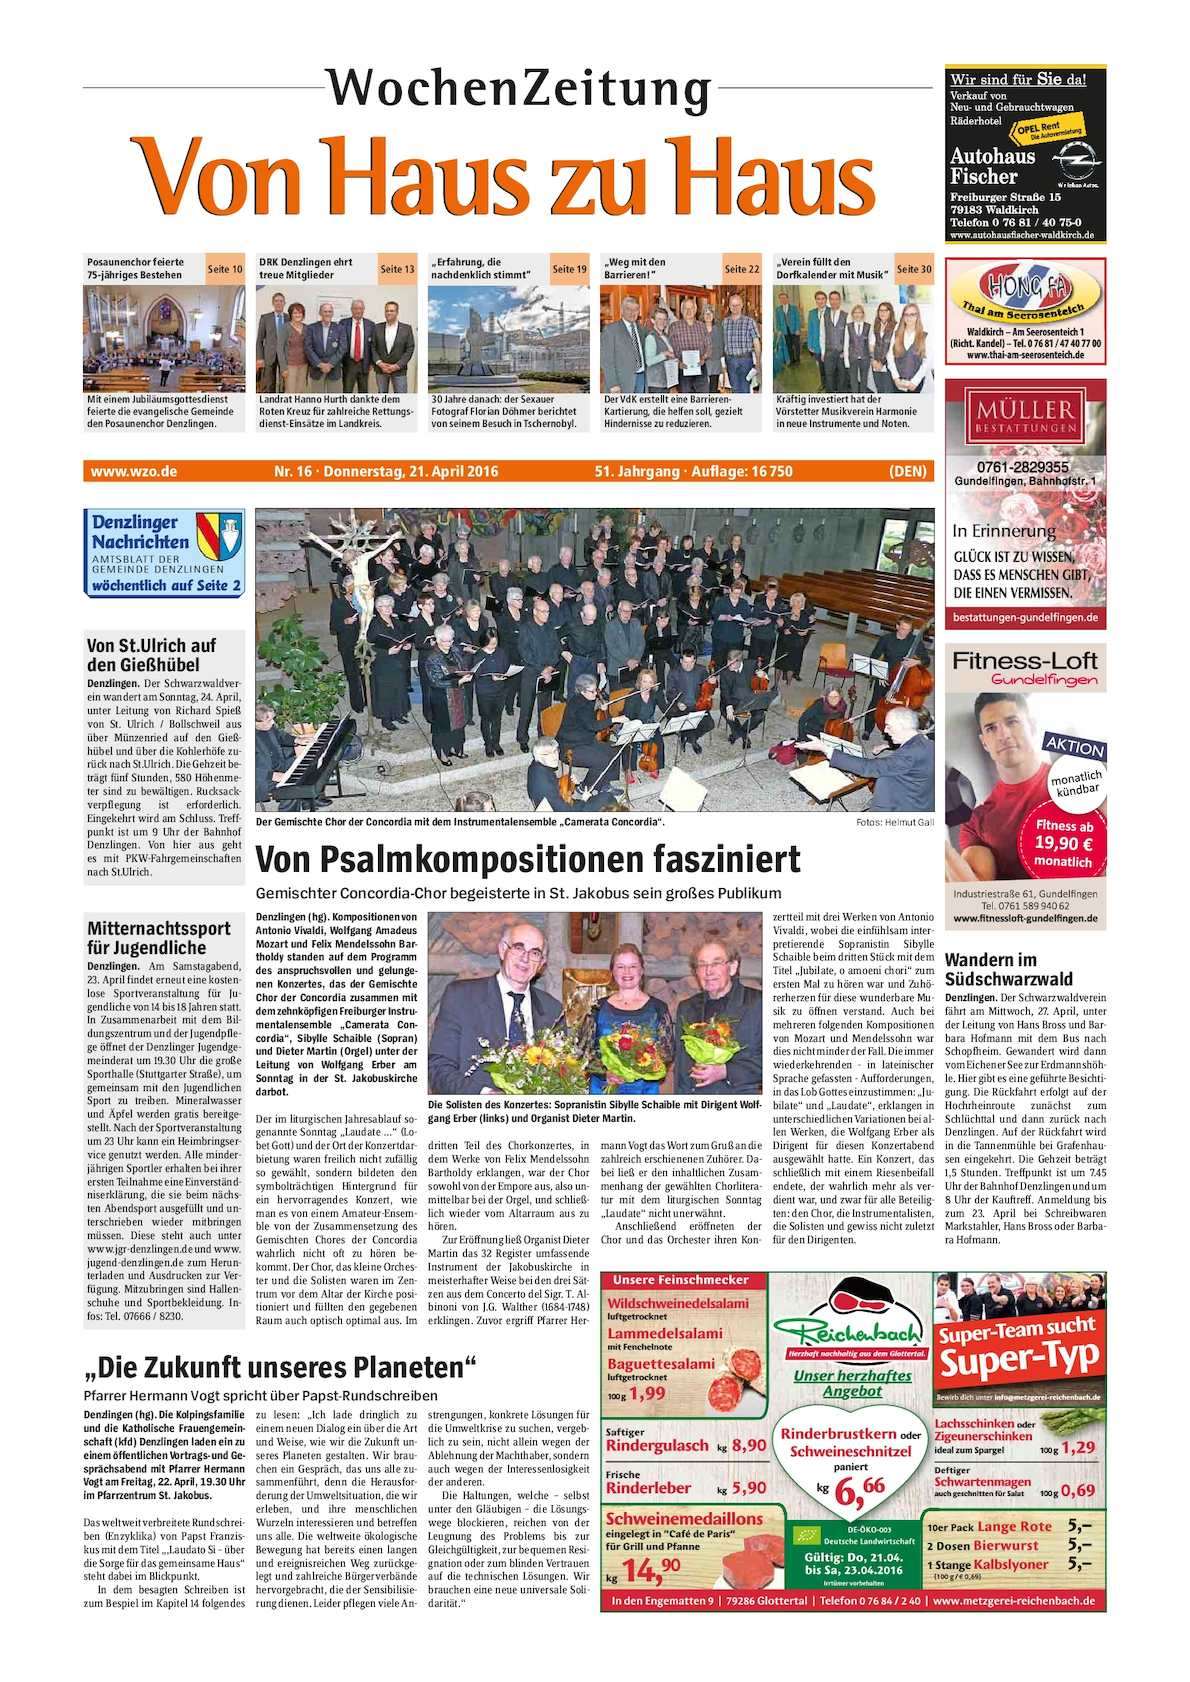 Calaméo VHZH Denzlingen Stadt